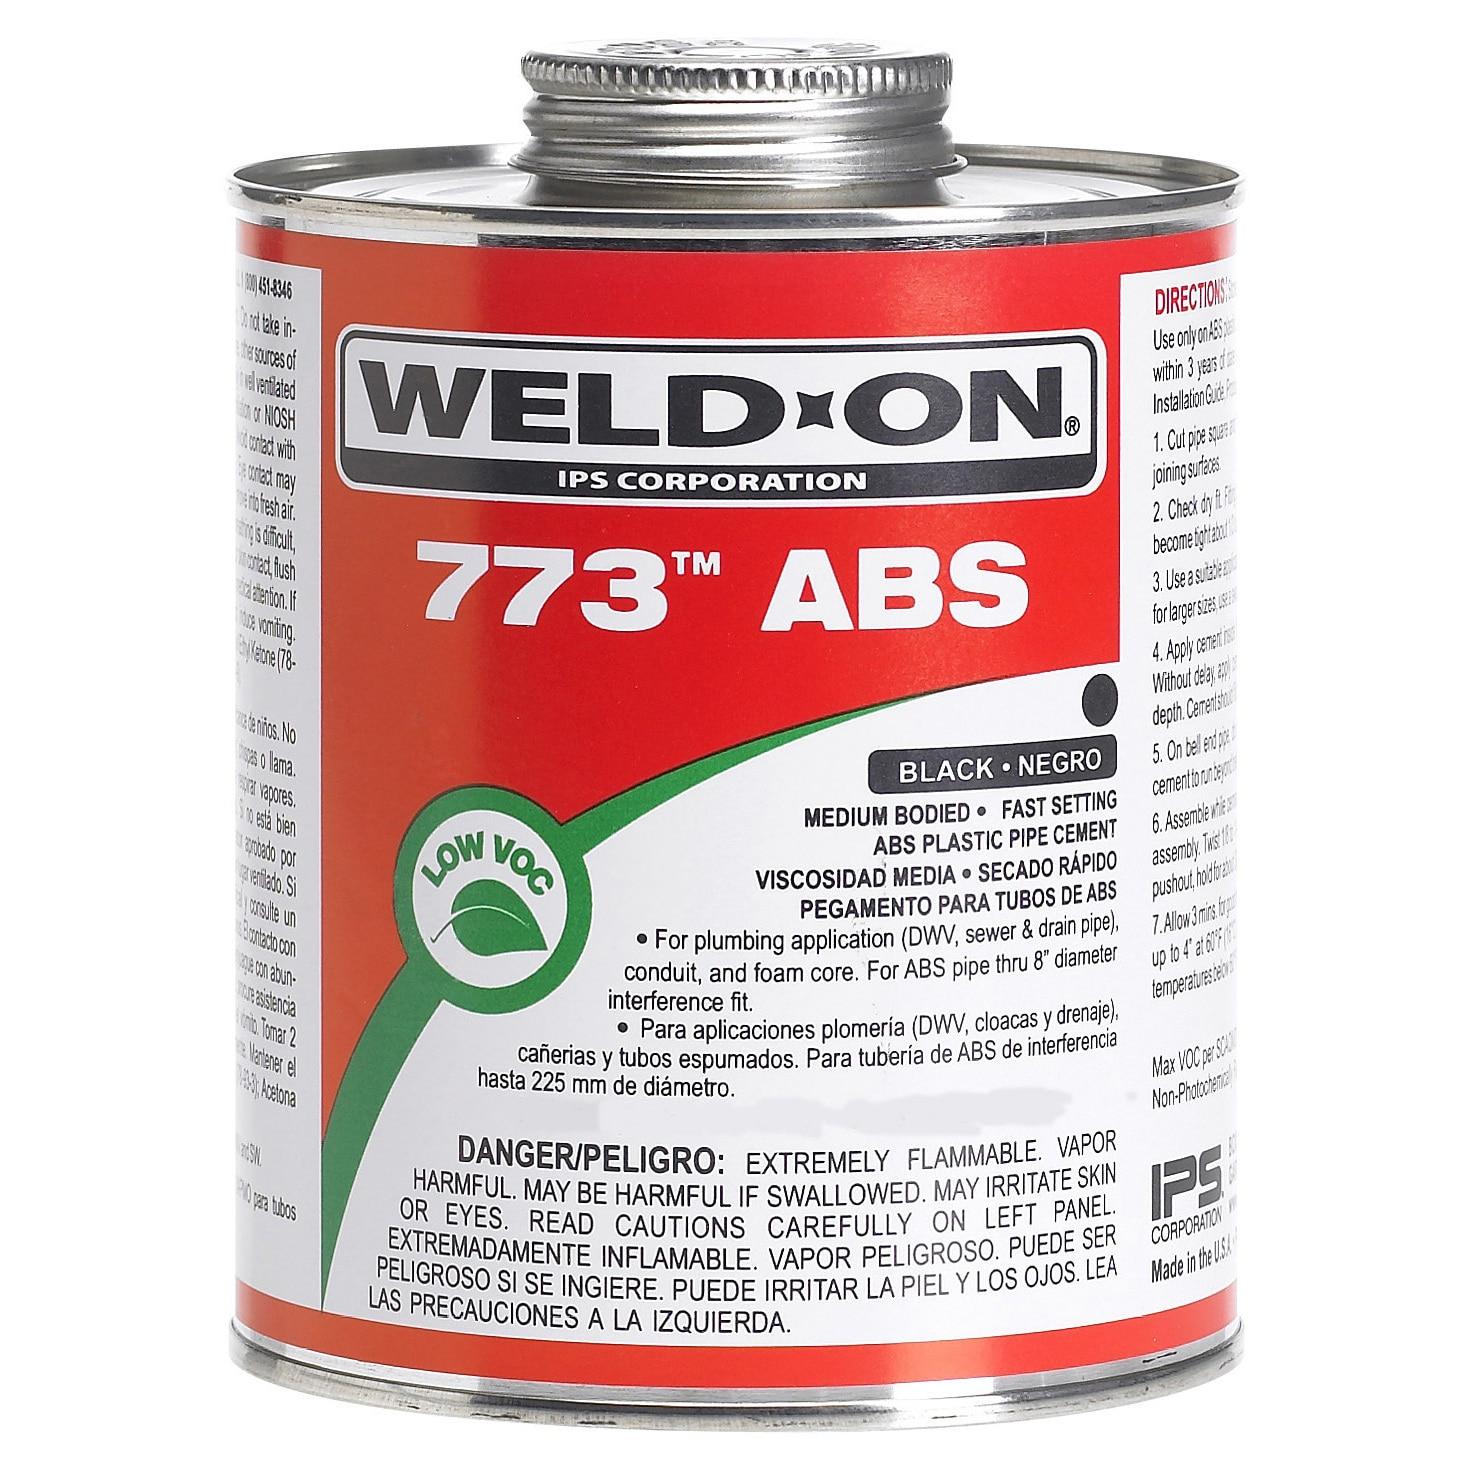 Ips Weldon 10246 1/4 Pint Black 773 ABS Plastic Pipe Ceme...